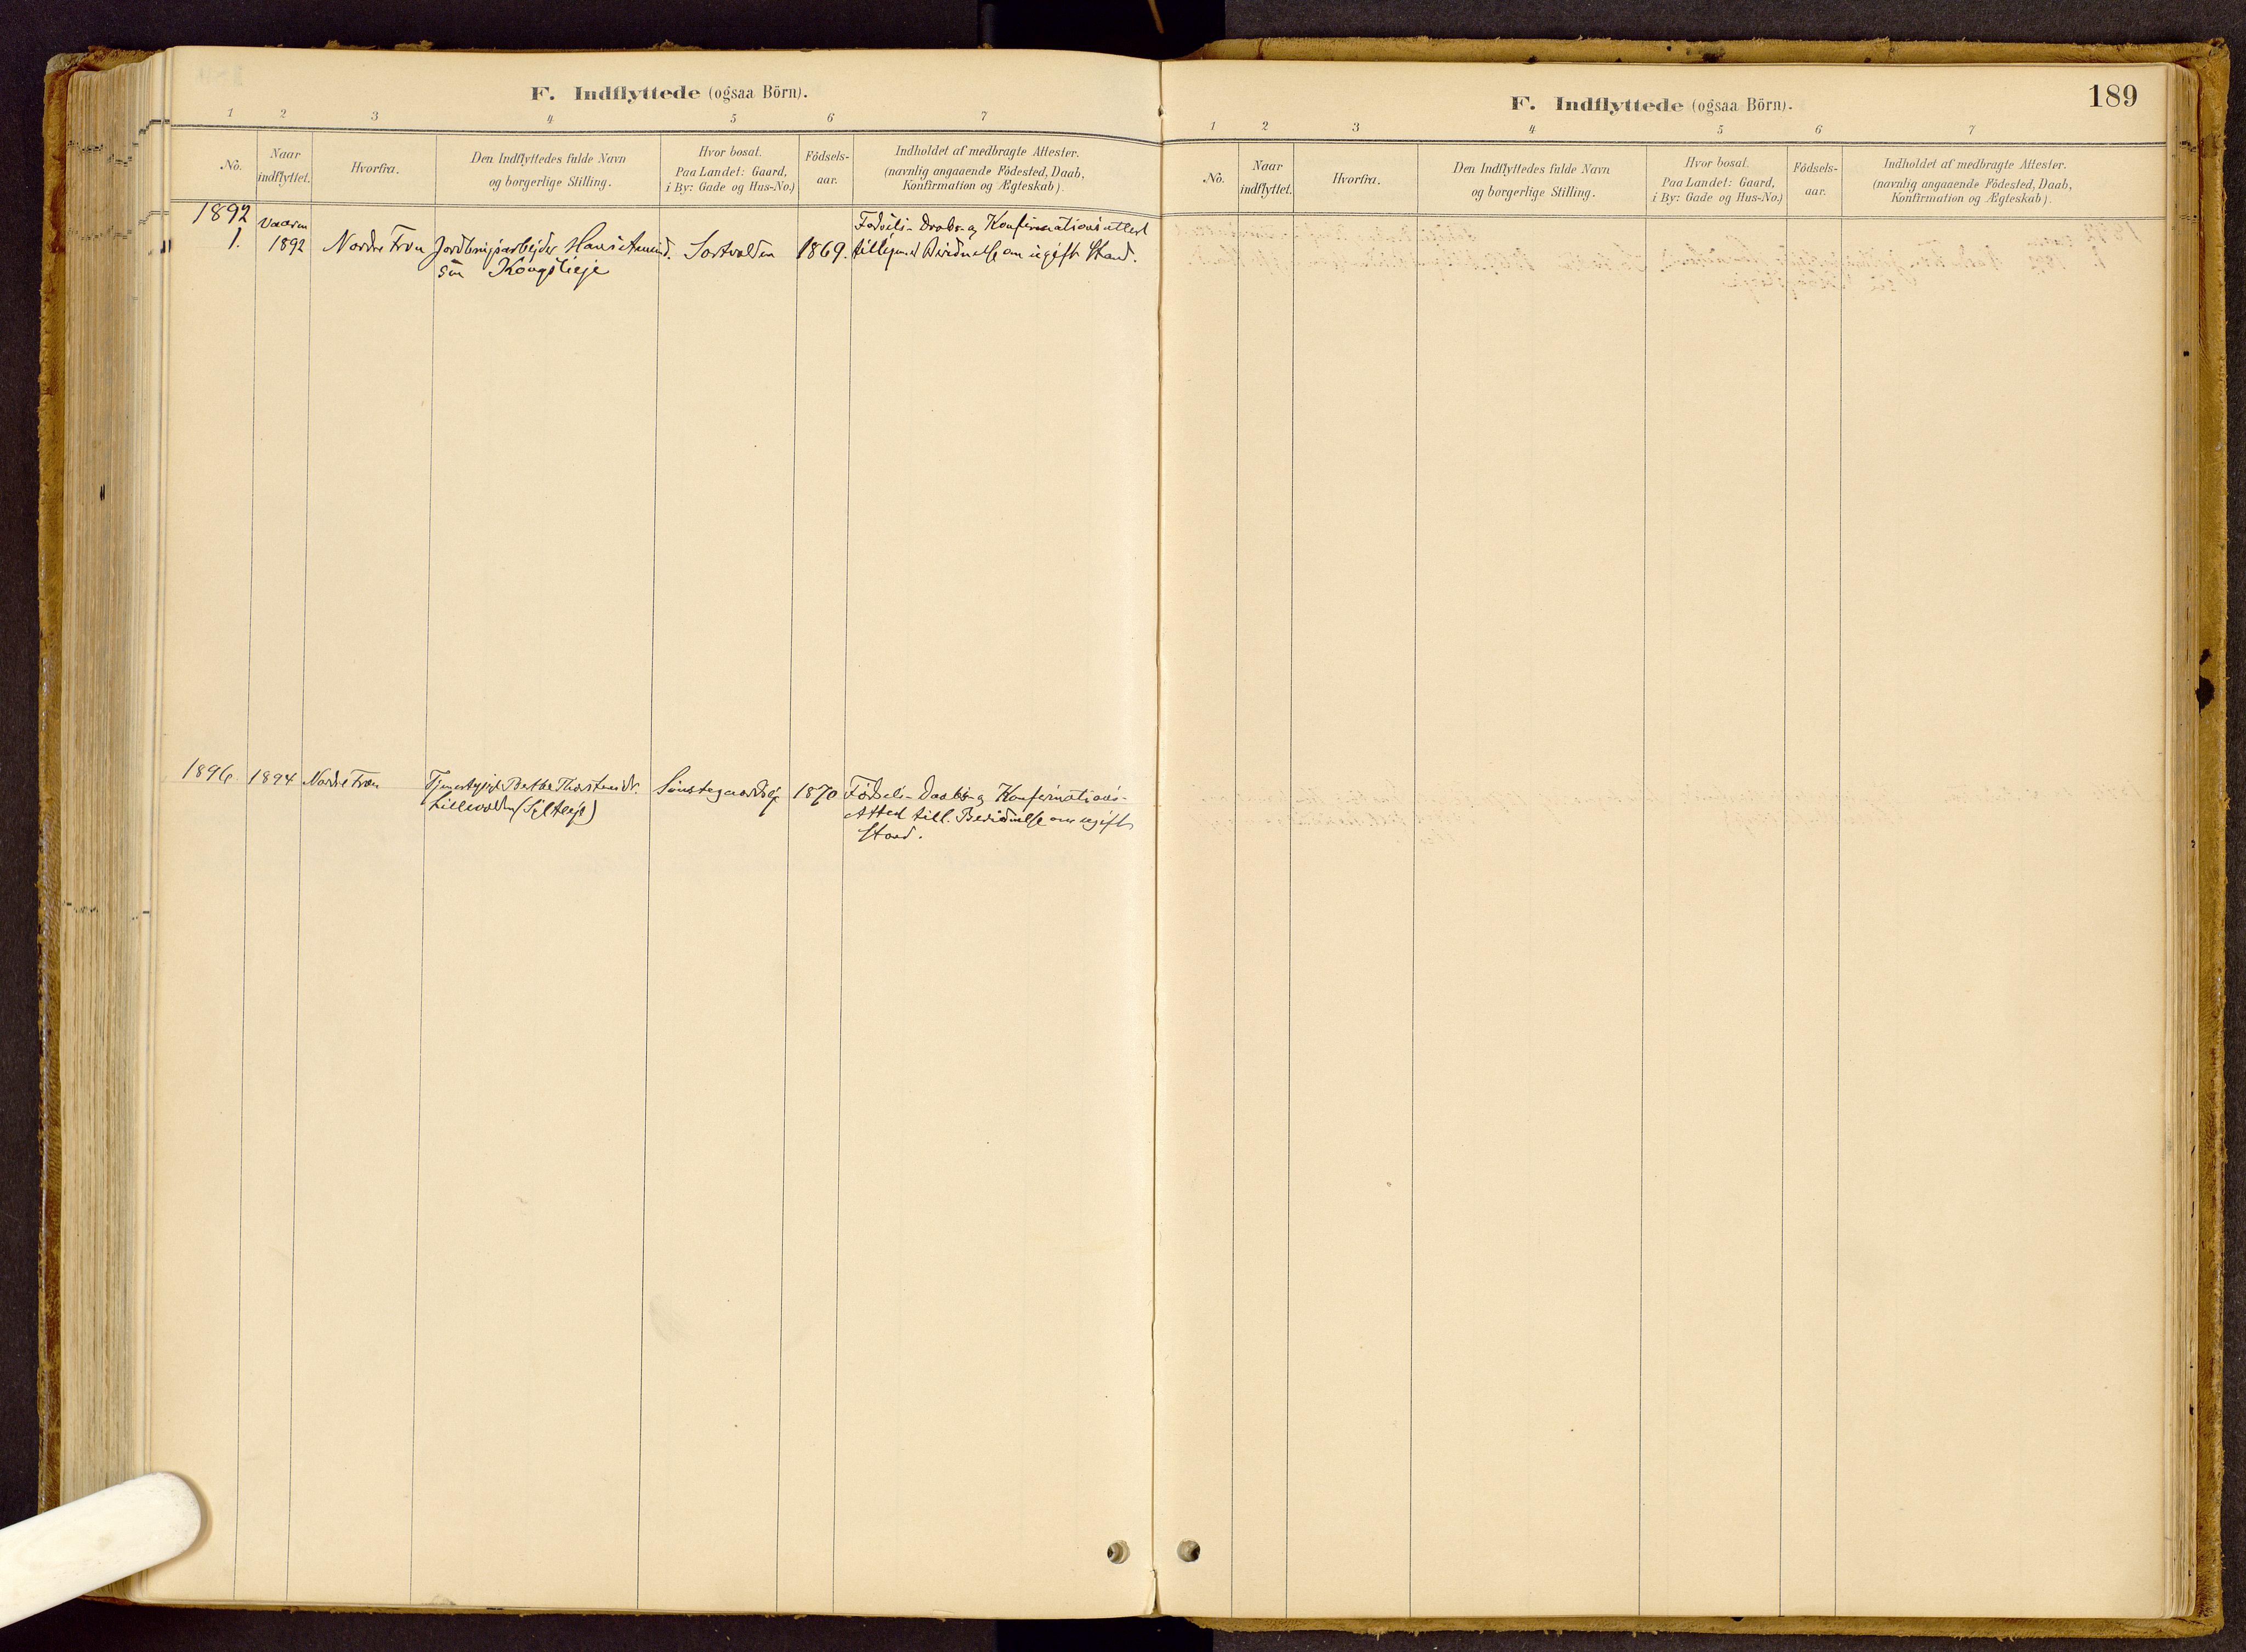 SAH, Vestre Gausdal prestekontor, Ministerialbok nr. 2, 1887-1918, s. 189